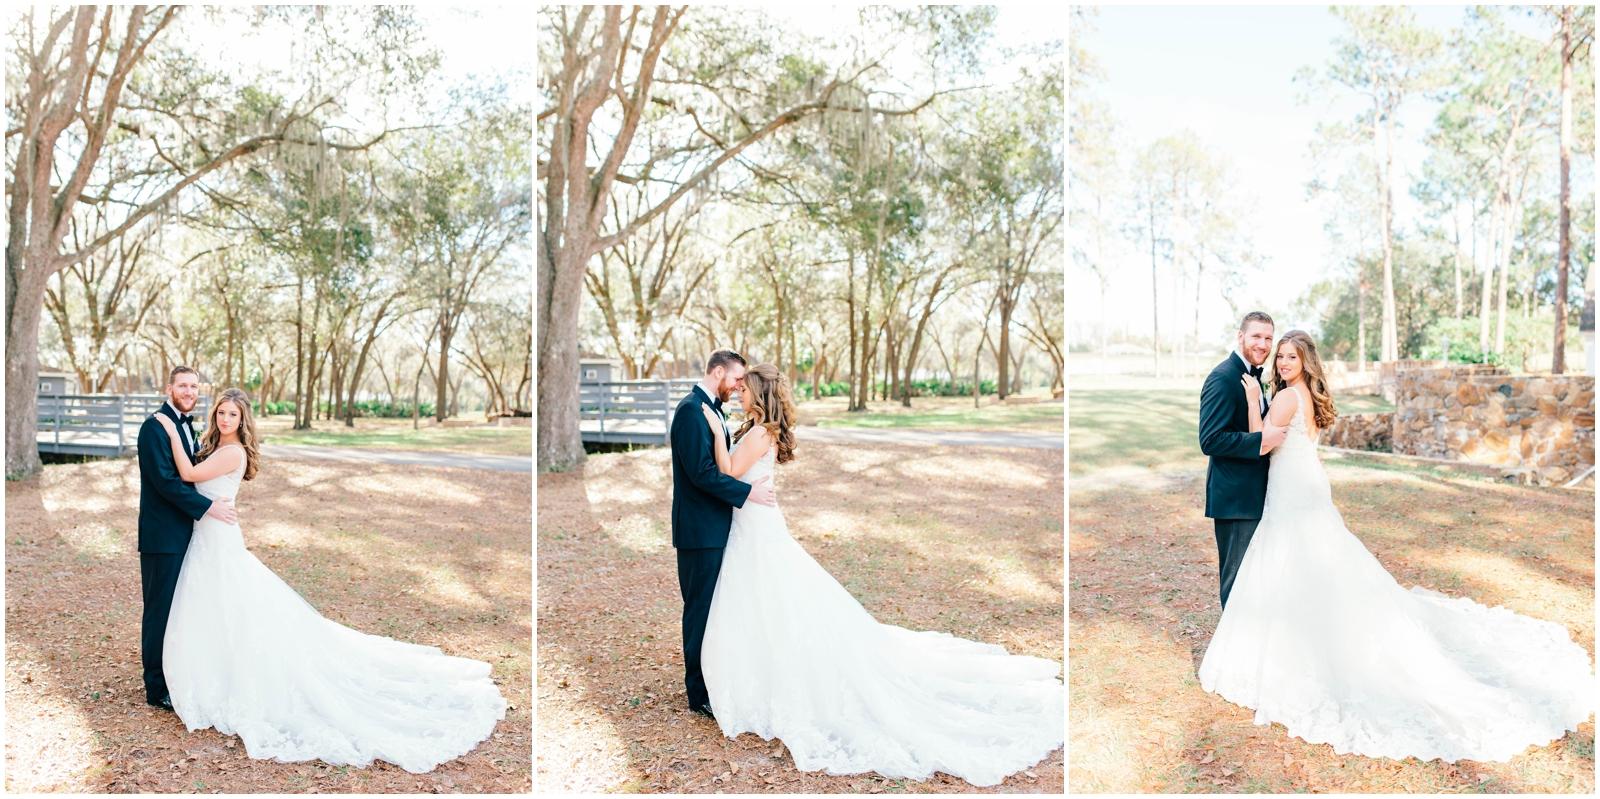 Tampa Area Wedding Venue with Southern Charm- Stonebridge Events_0271.jpg